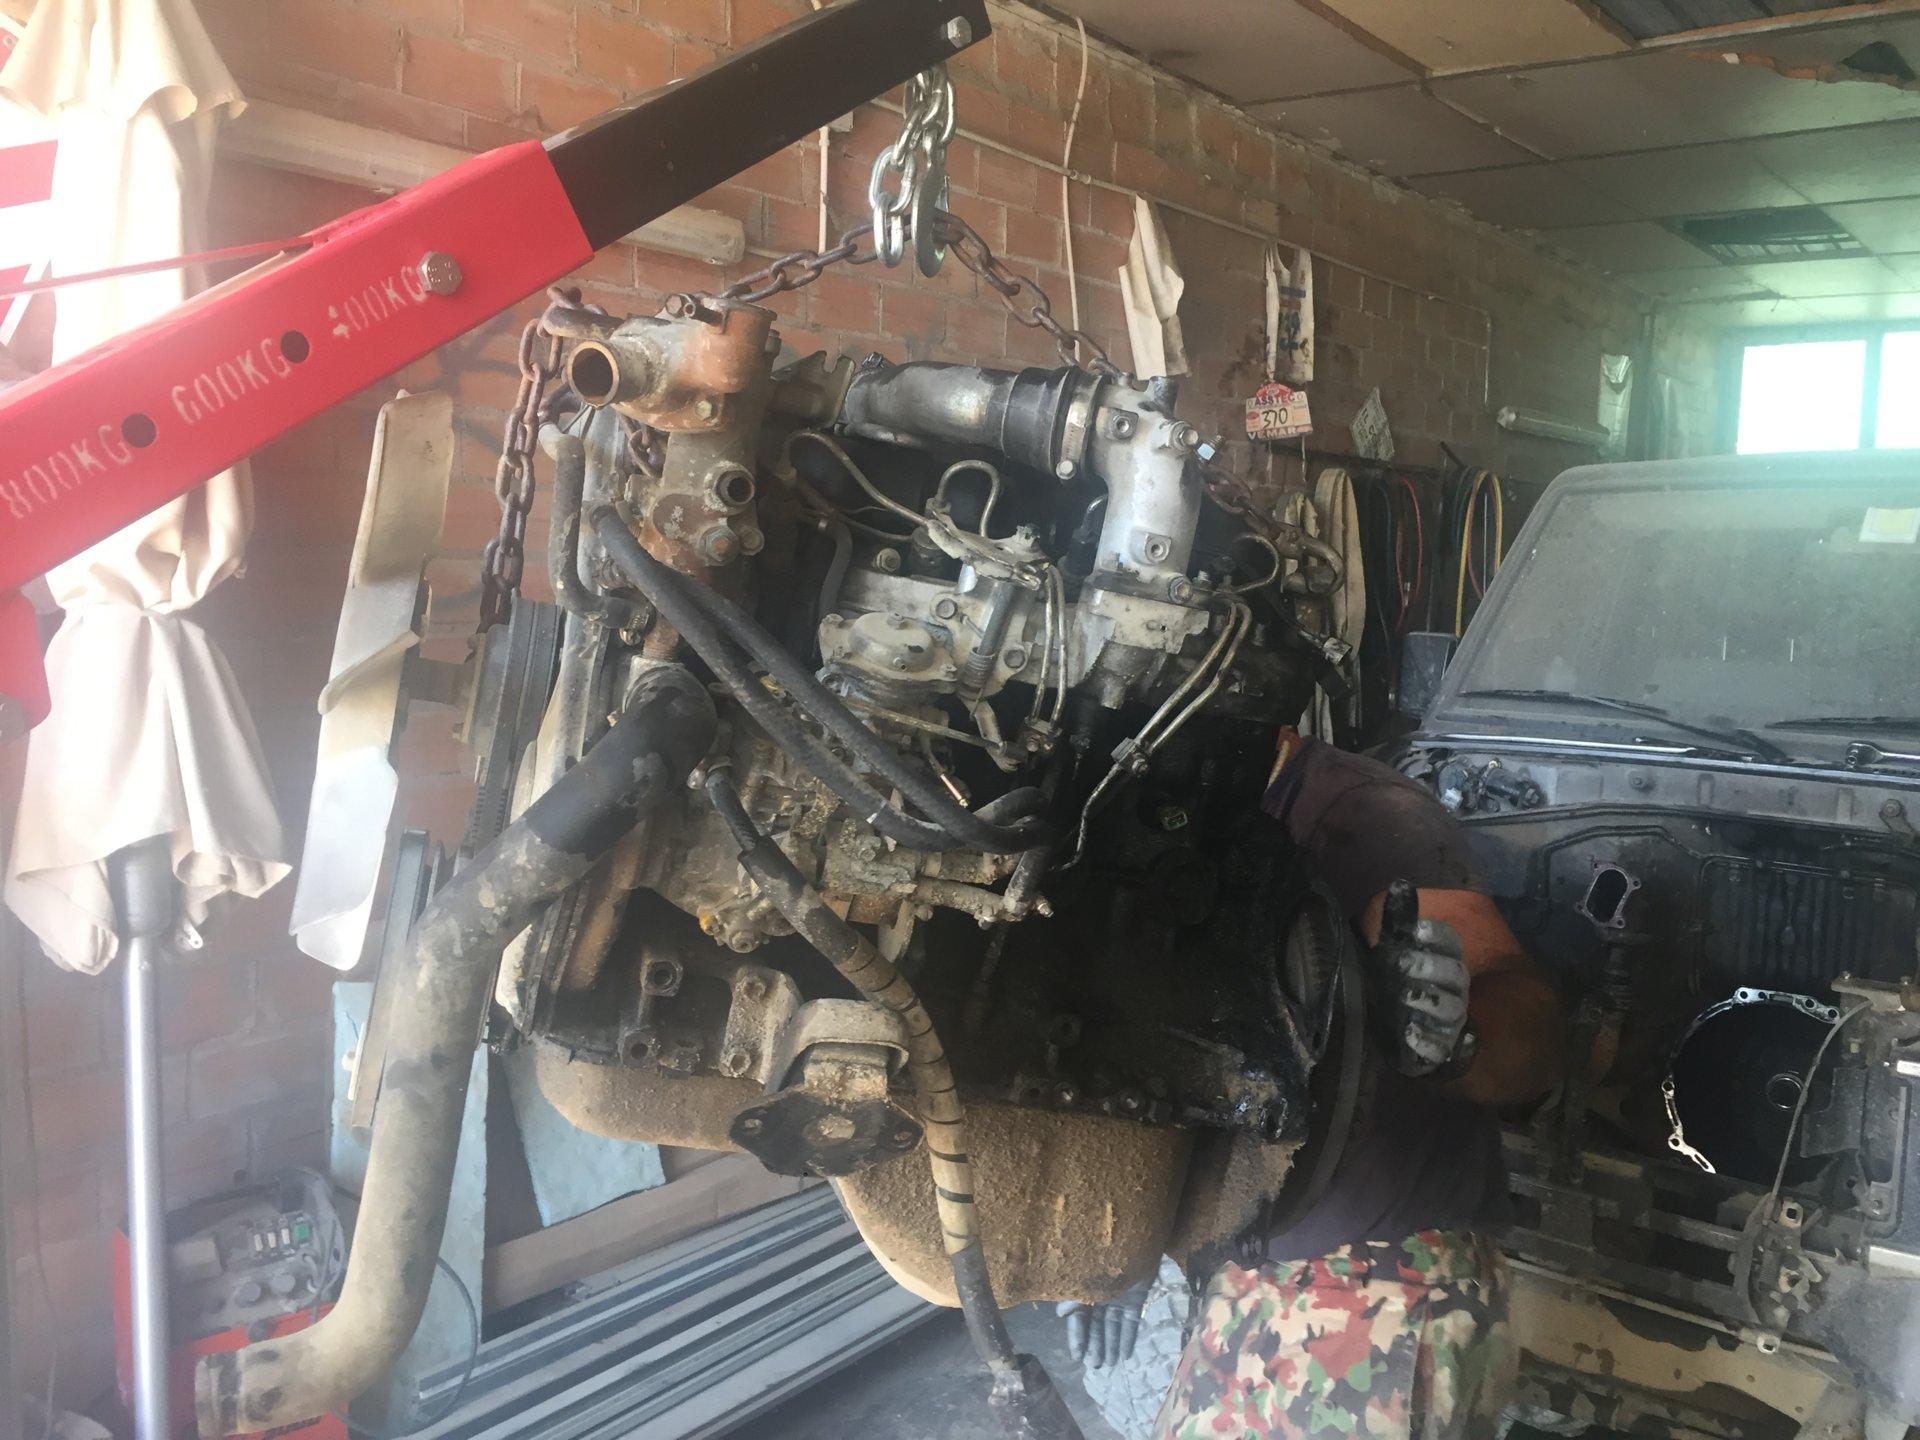 60F433E7-DF96-415D-BABD-A624FE08ED2C.jpeg